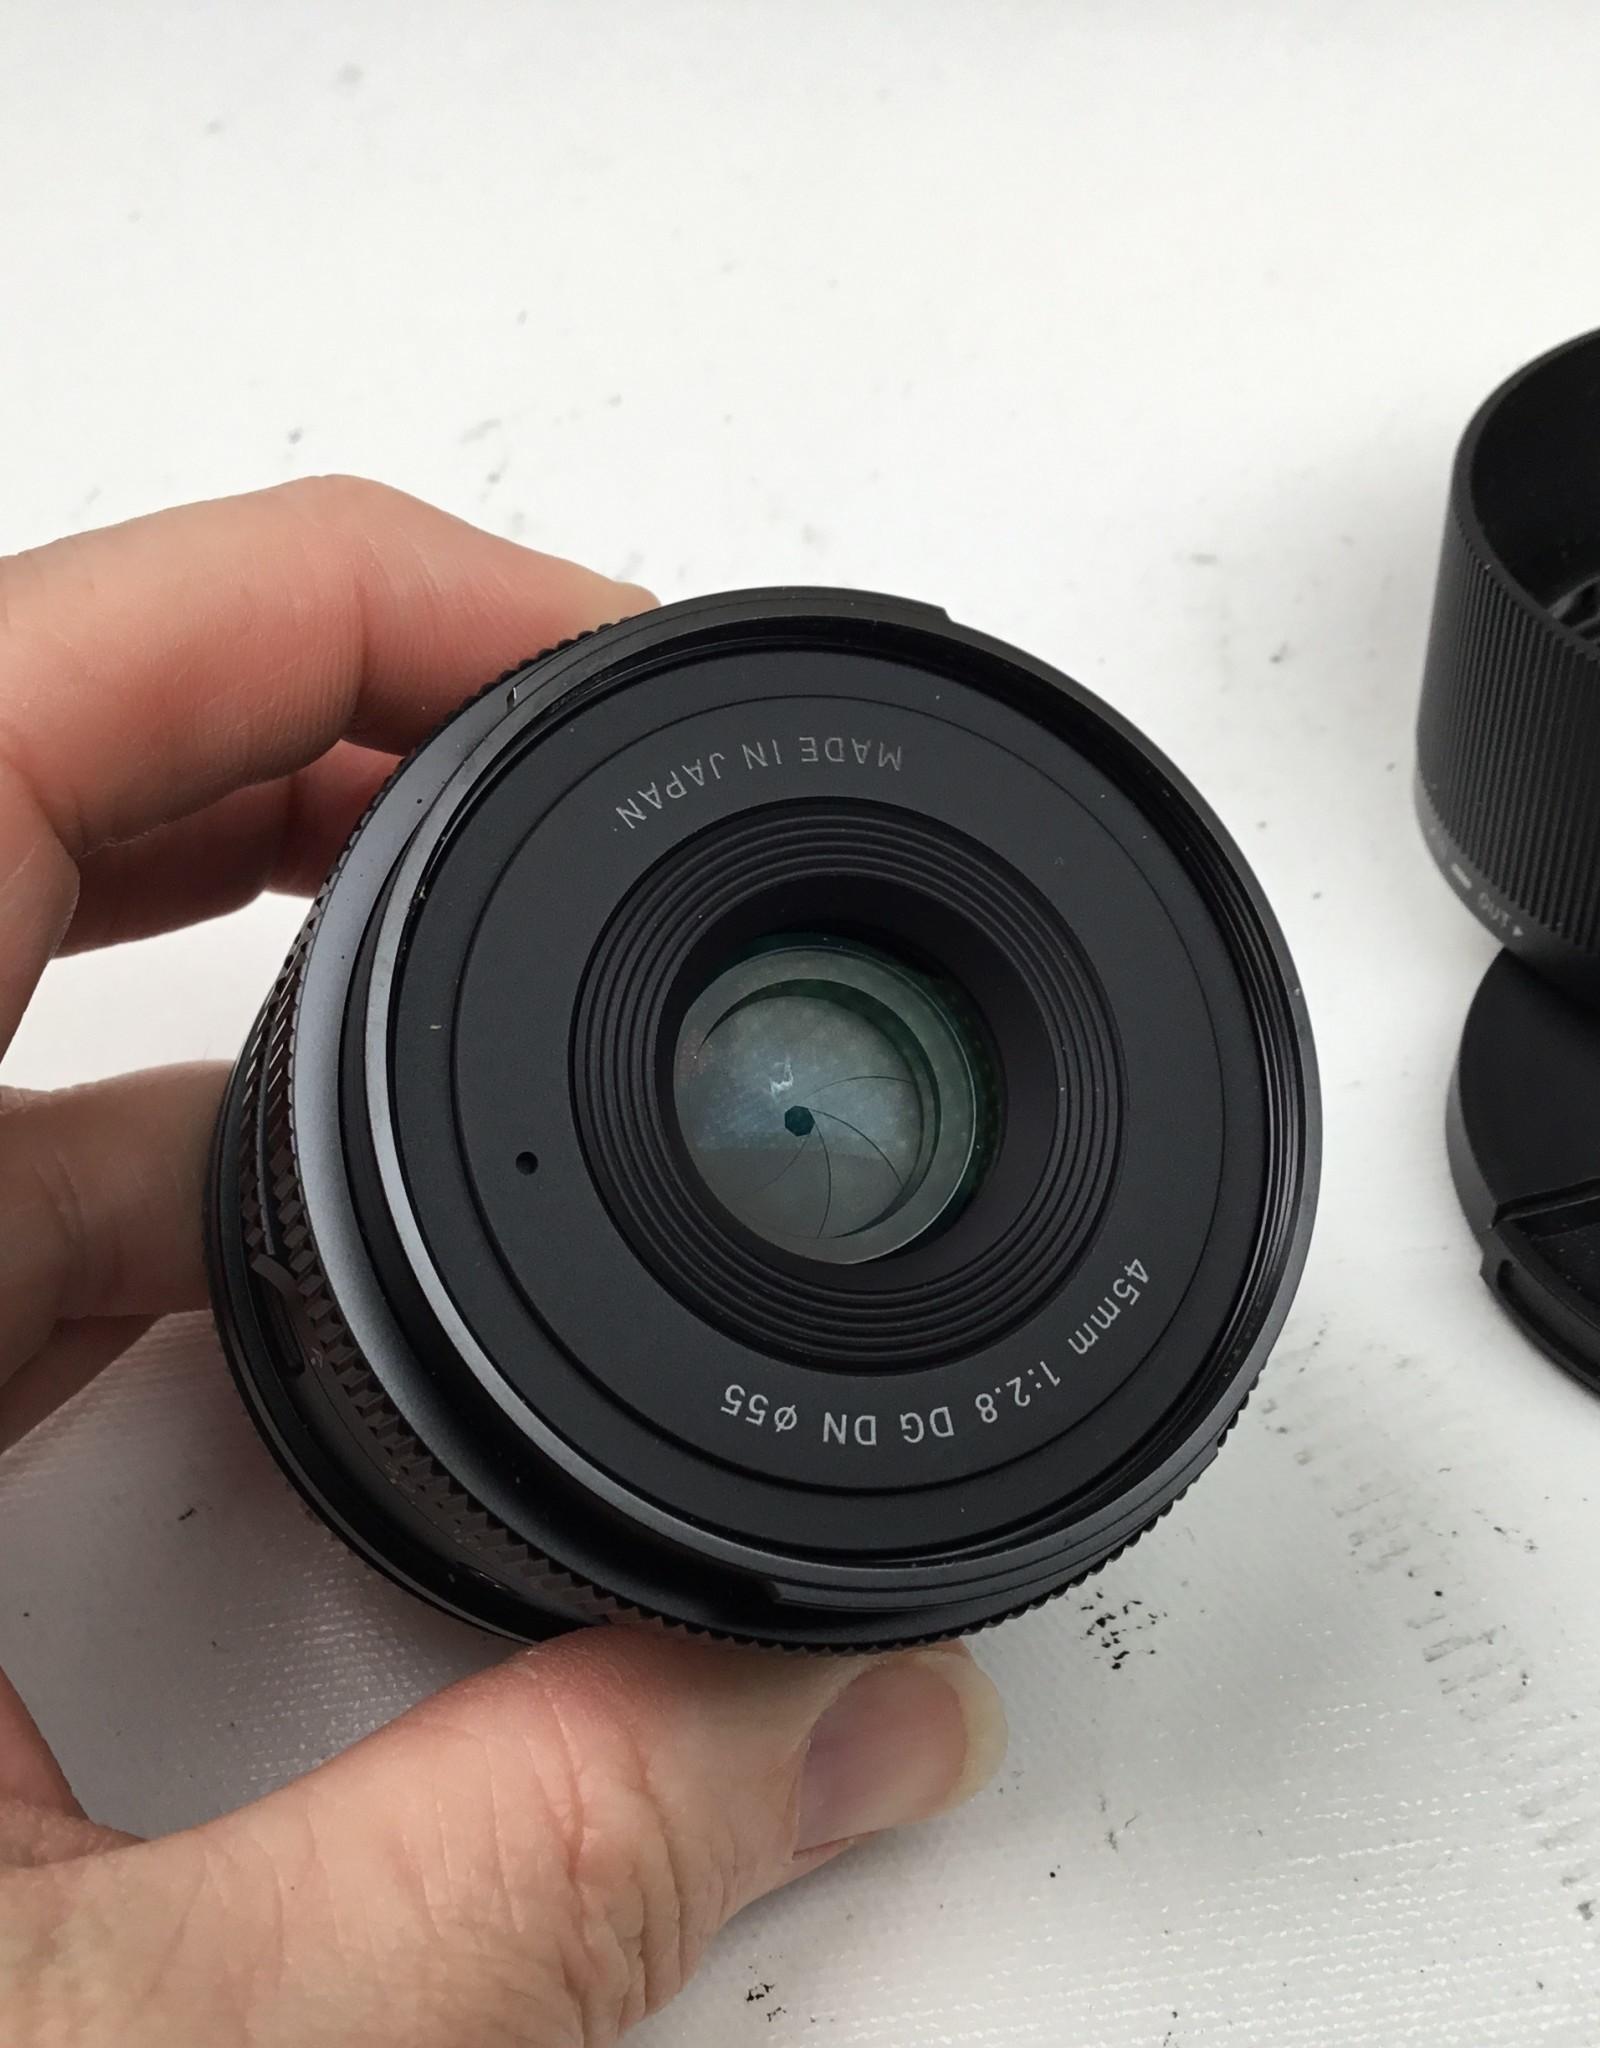 SIGMA Sigma DG DN 45mm f2.8 L Mount Lens Used EX